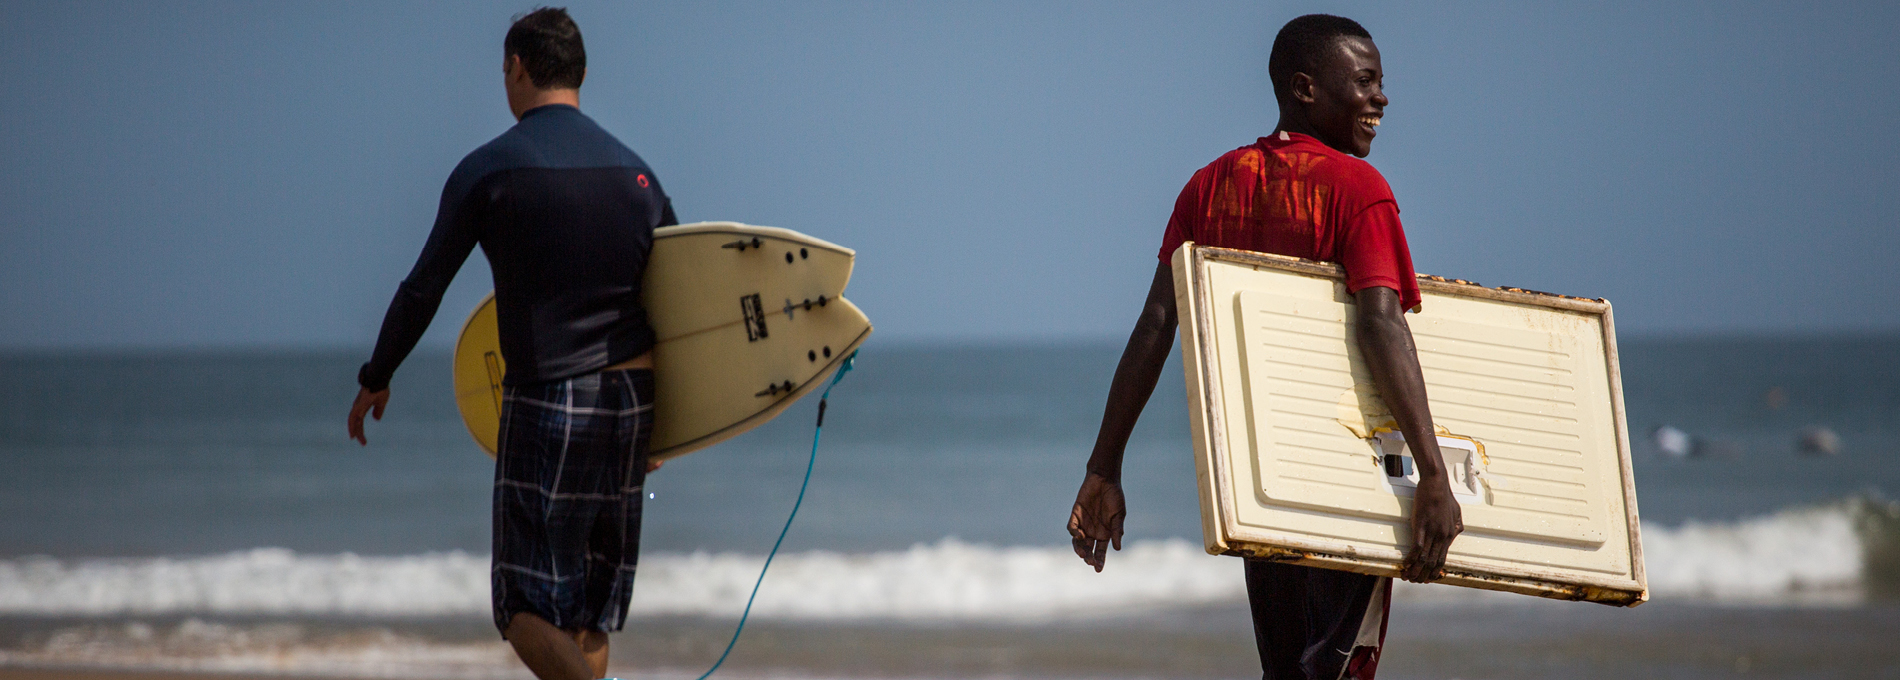 <span>O paraíso de ondas perfeitas em Angola</span>